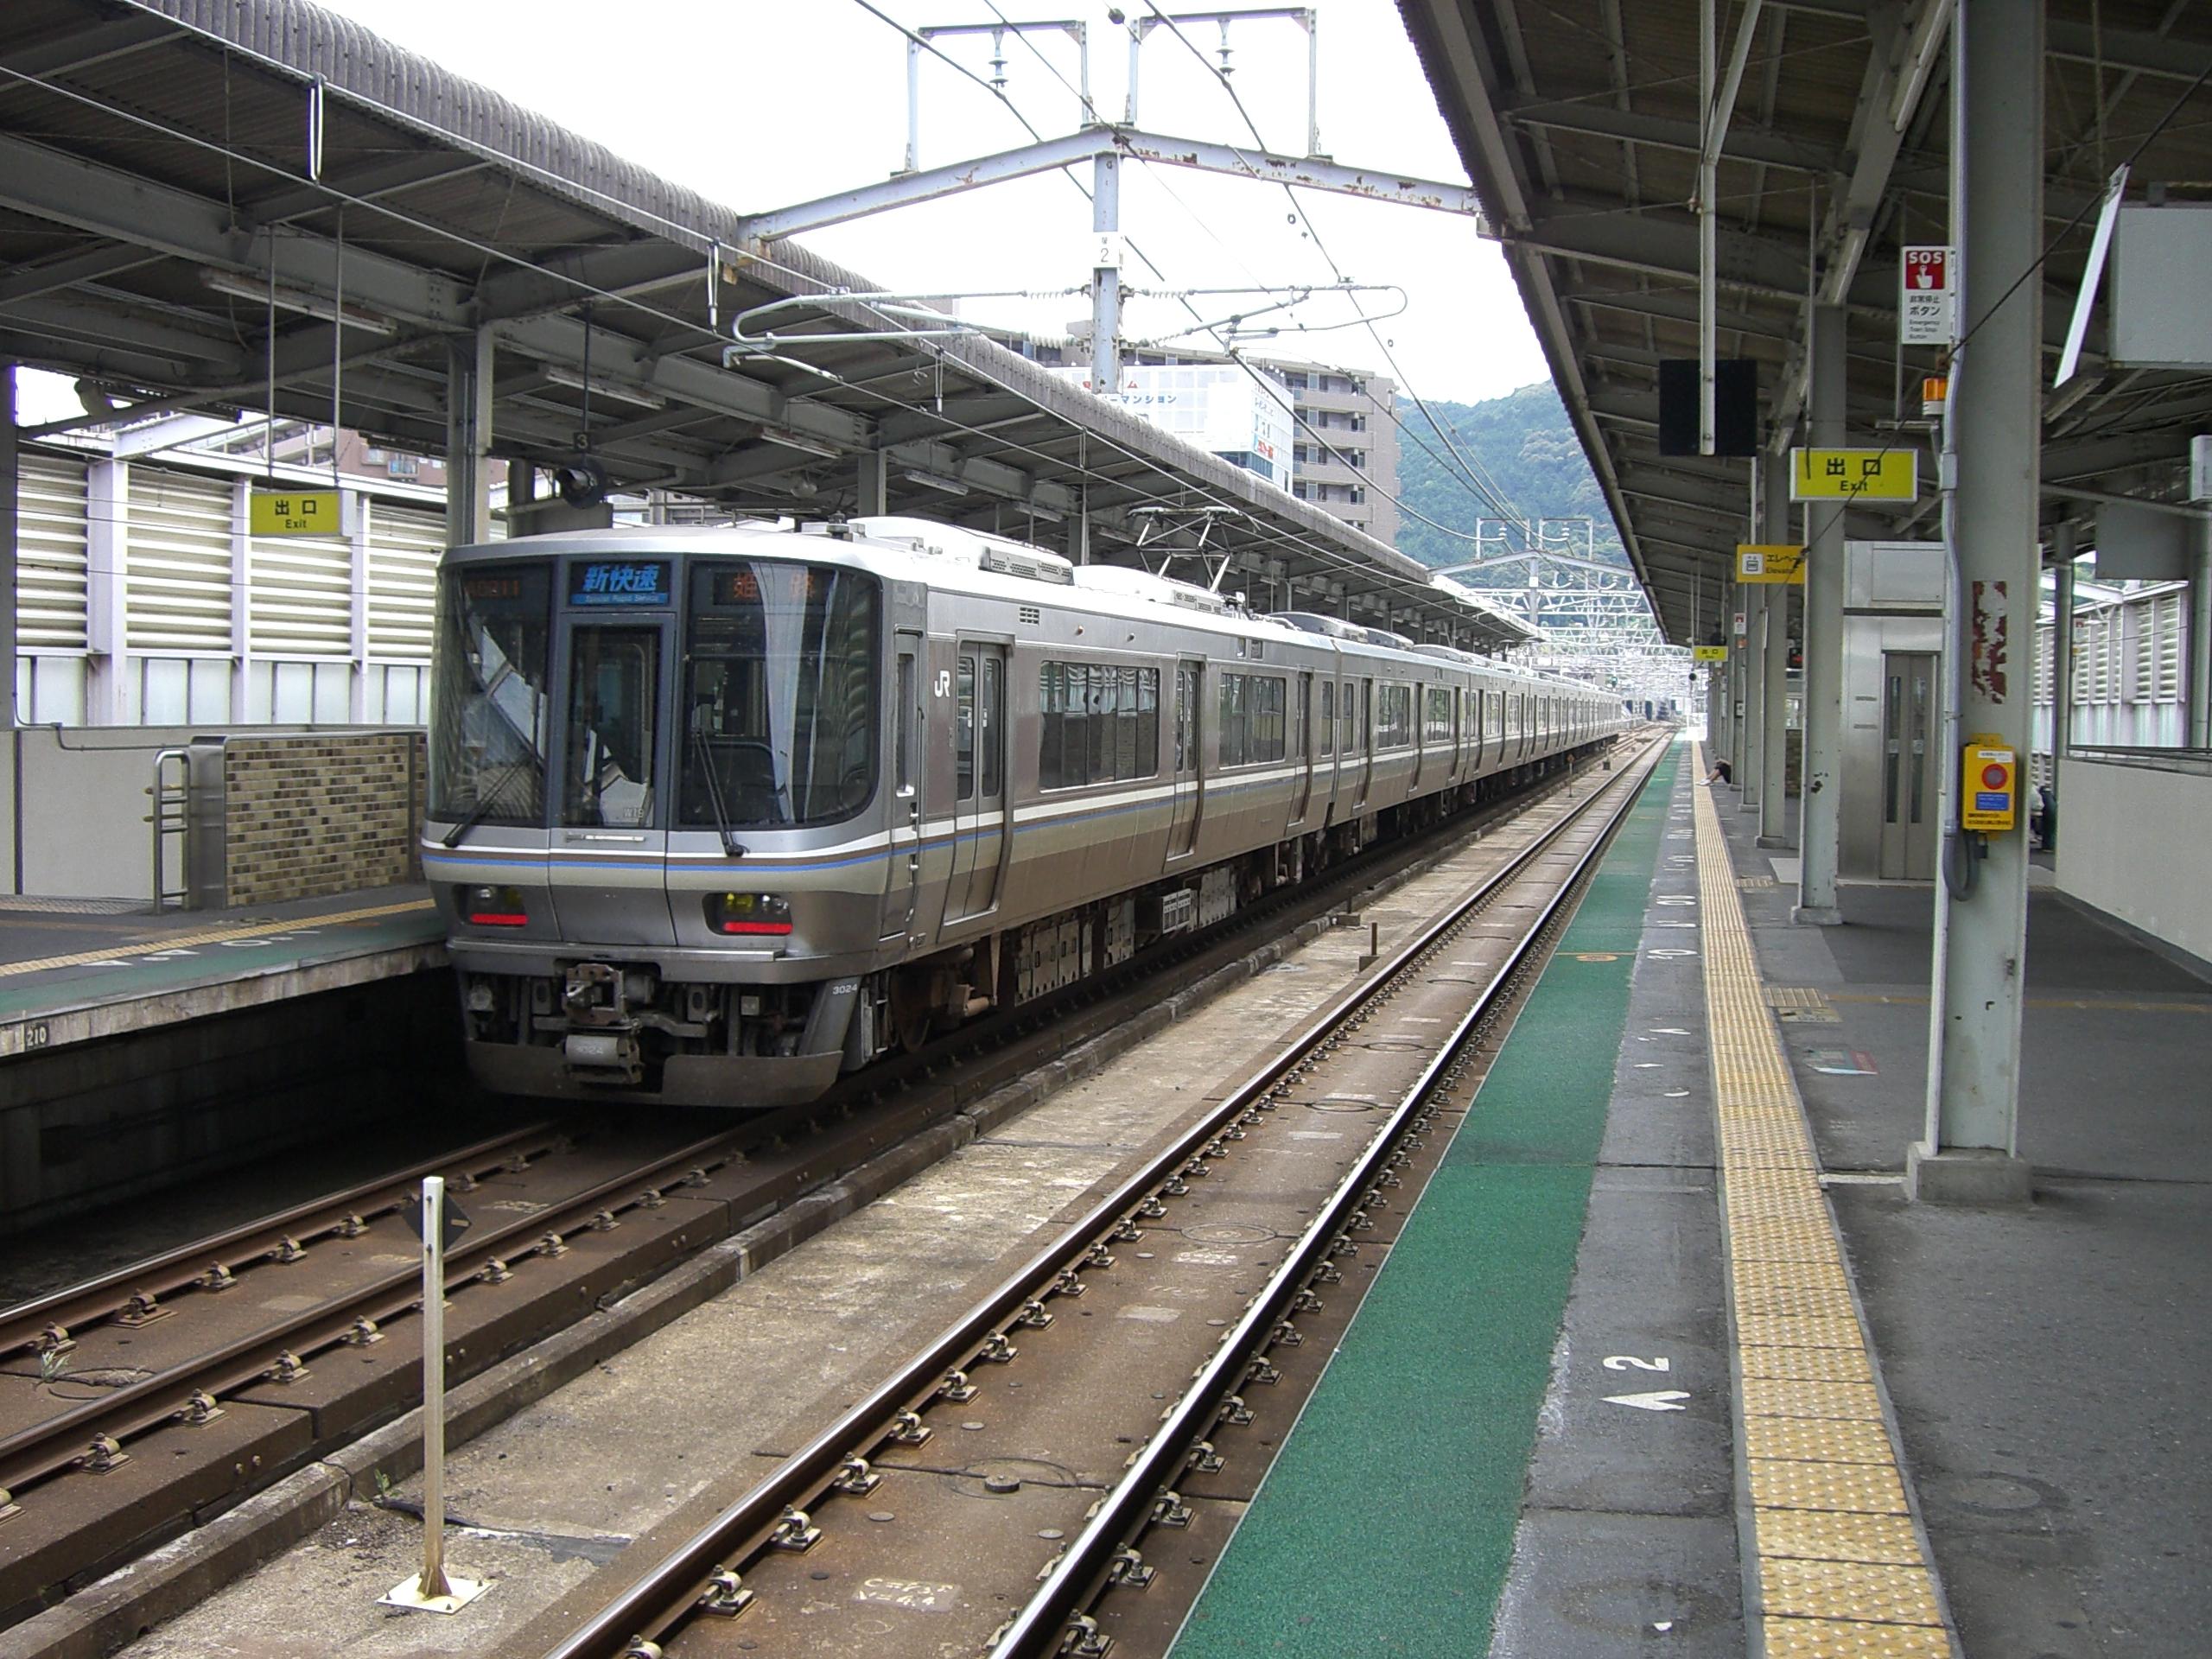 https://upload.wikimedia.org/wikipedia/commons/0/0e/JR-West_NishiOtsu_Station_Platform.JPG